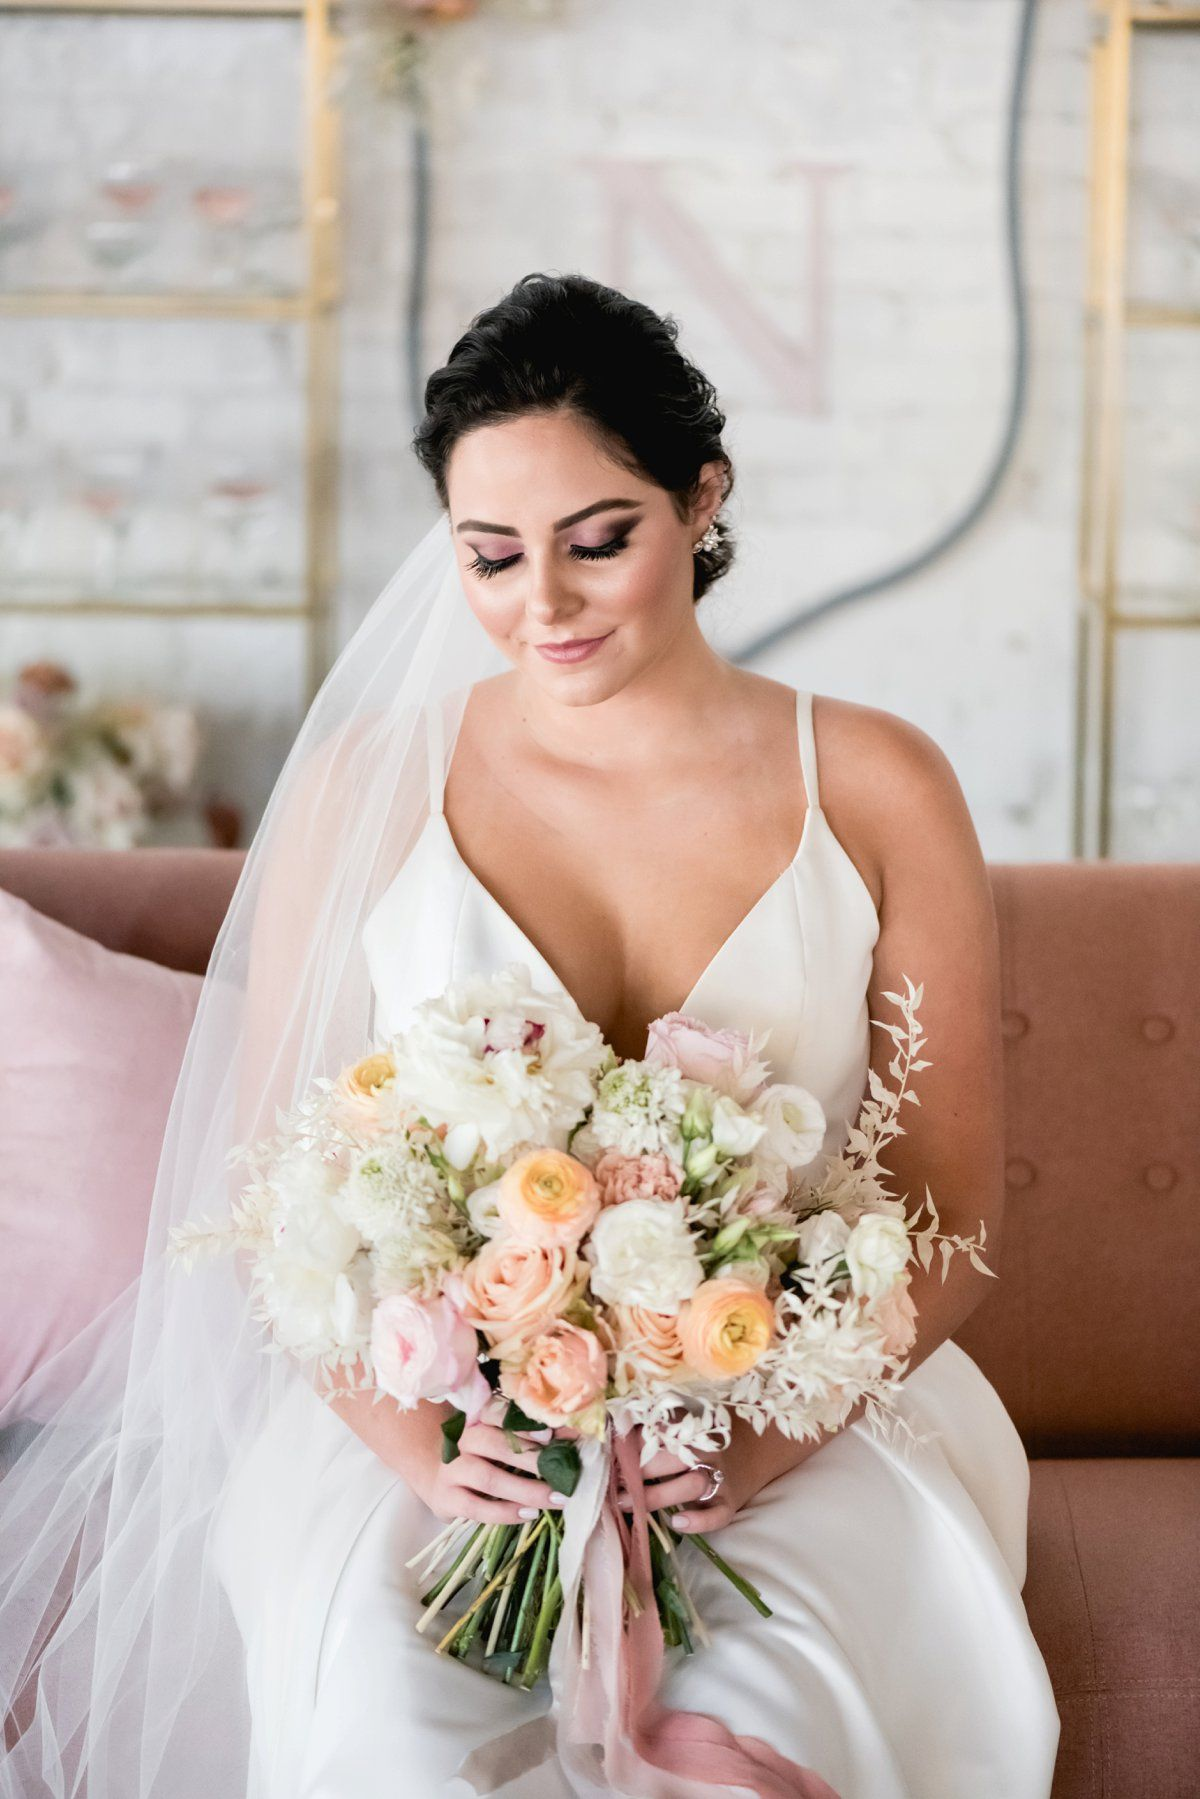 Modern Elegant Blush and Gold Wedding Ideas Blush, gold